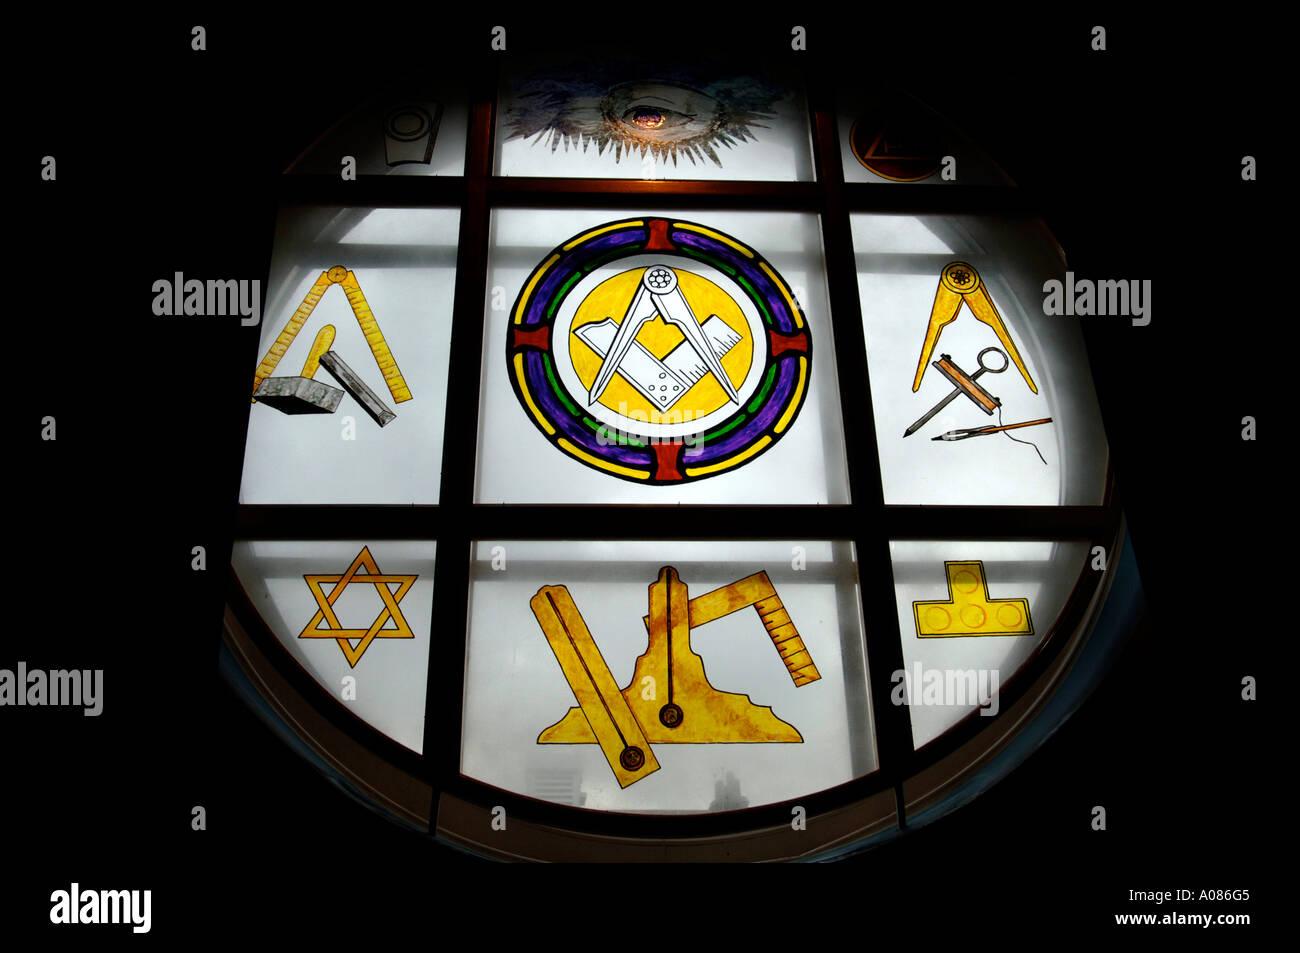 Freemasons Symbol Stock Photos Freemasons Symbol Stock Images Alamy